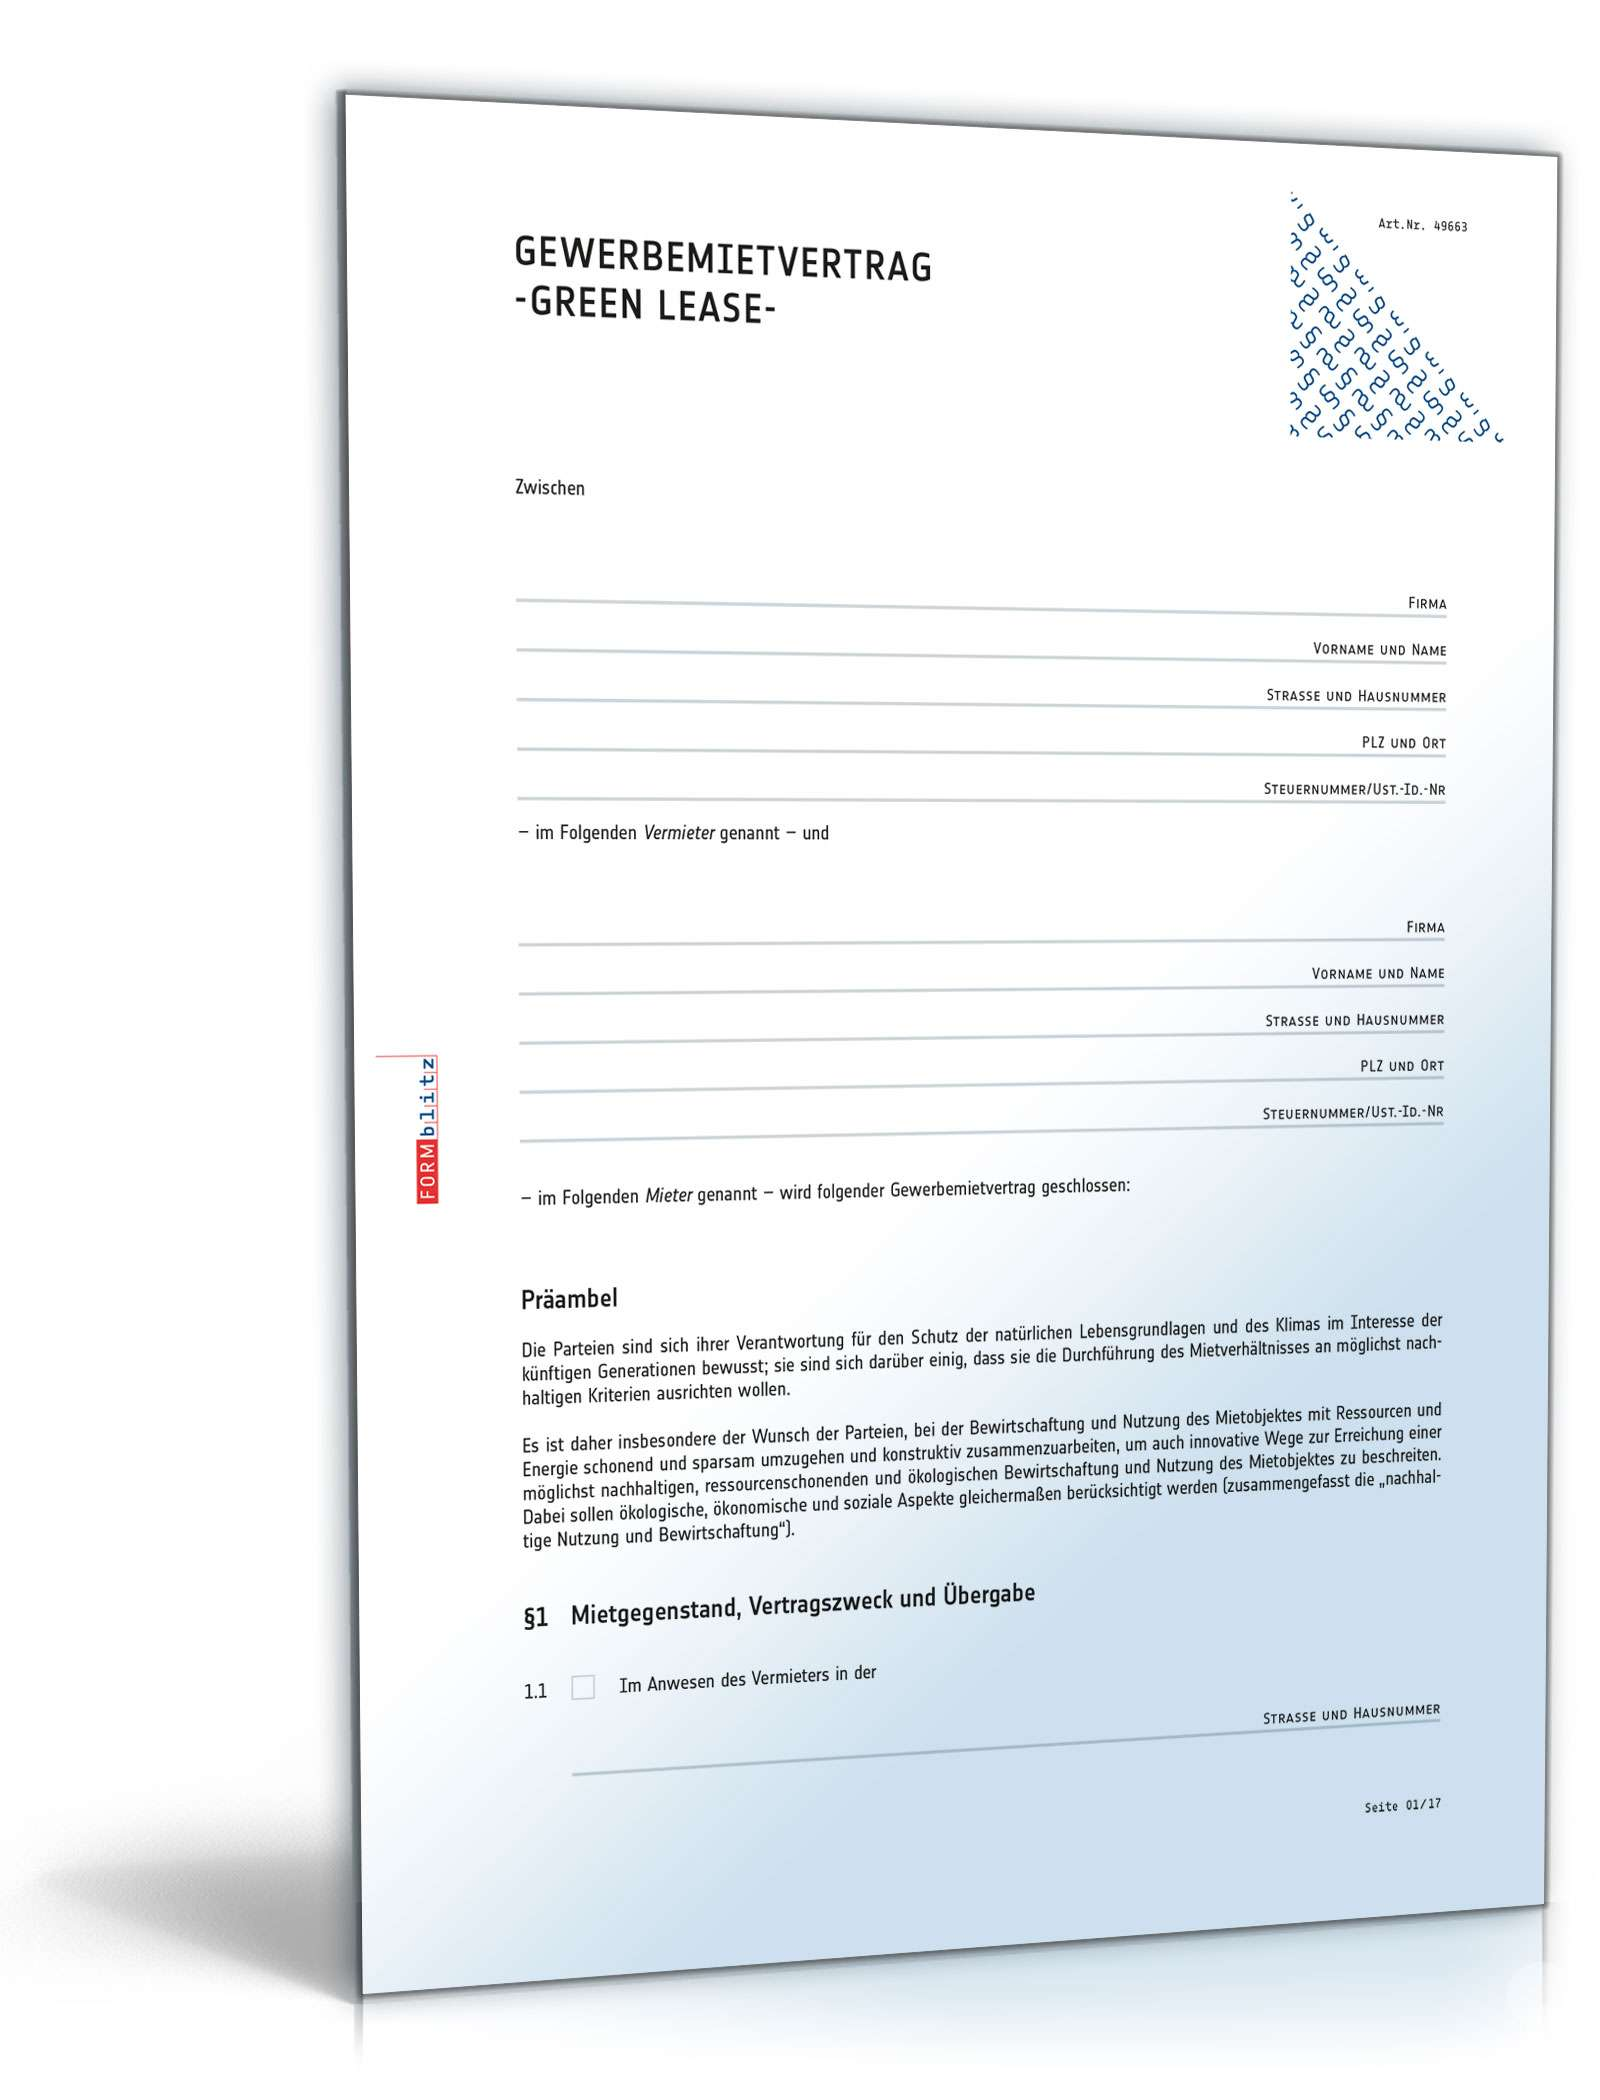 Grüner Mietvertrag Gewerbe: Rechtssicheres Muster zum Download